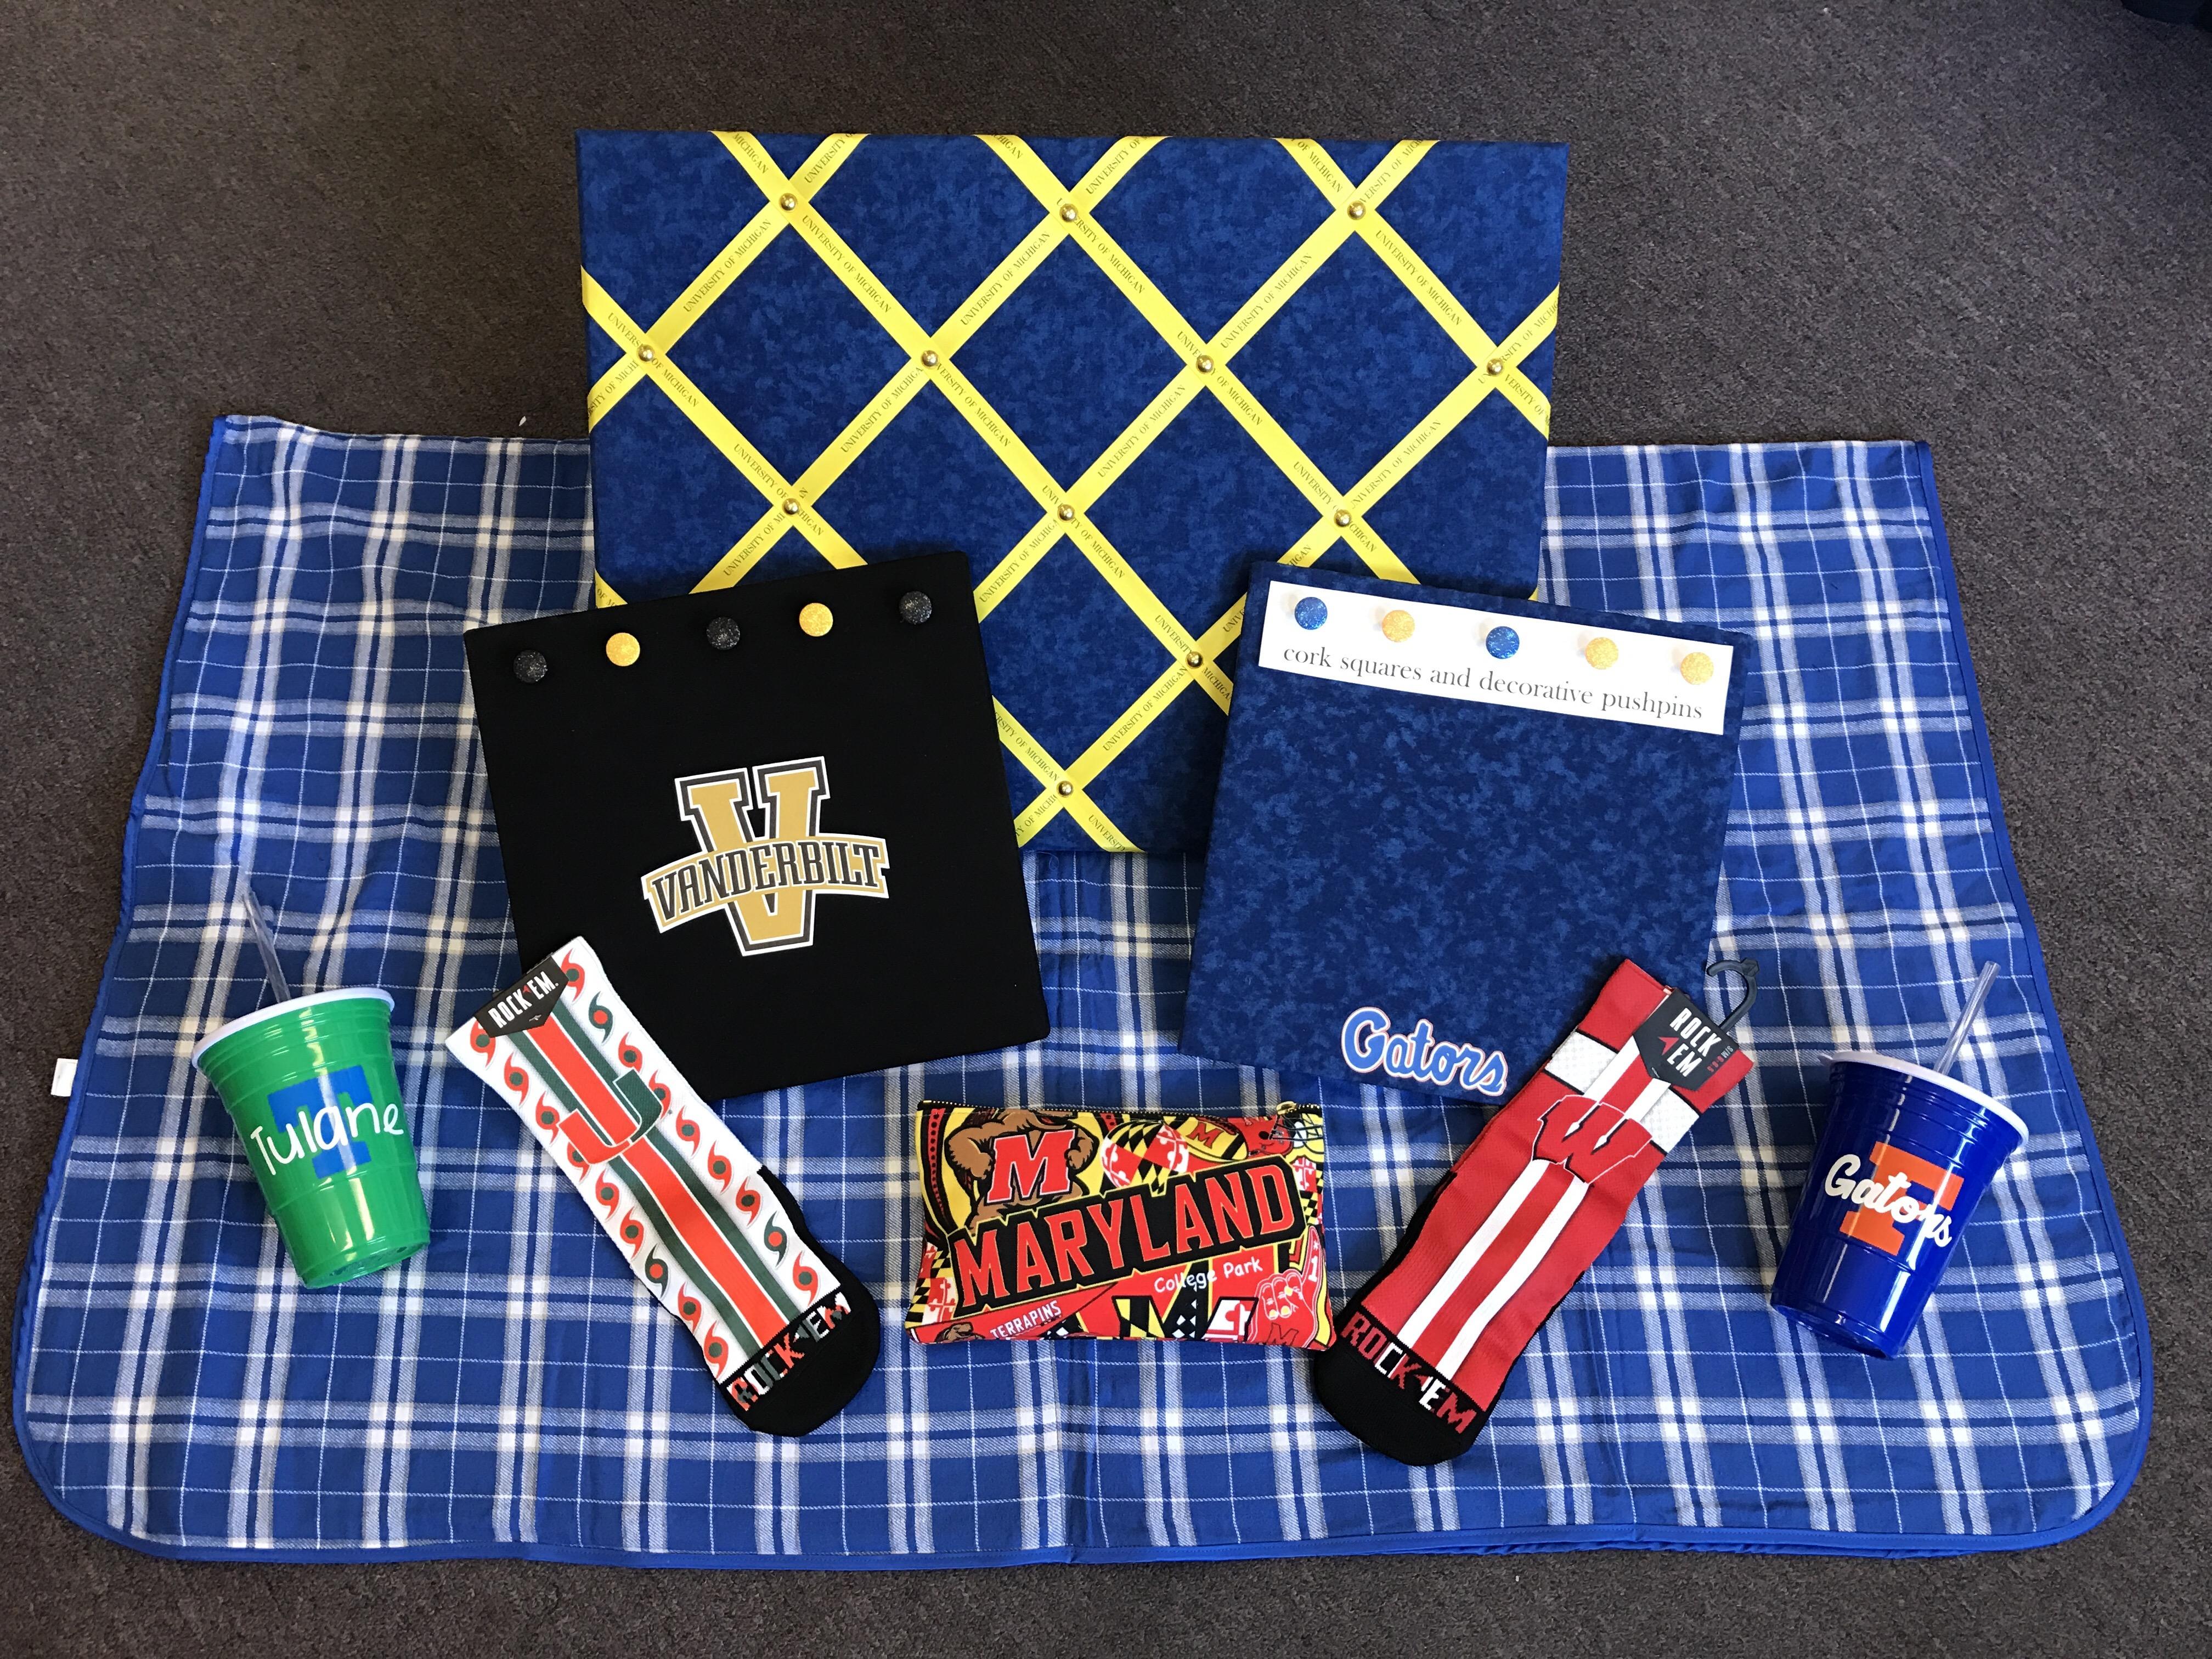 Holiday gifts baskets the pampered professional ltd hewlett ny monogram personalize customize negle Choice Image